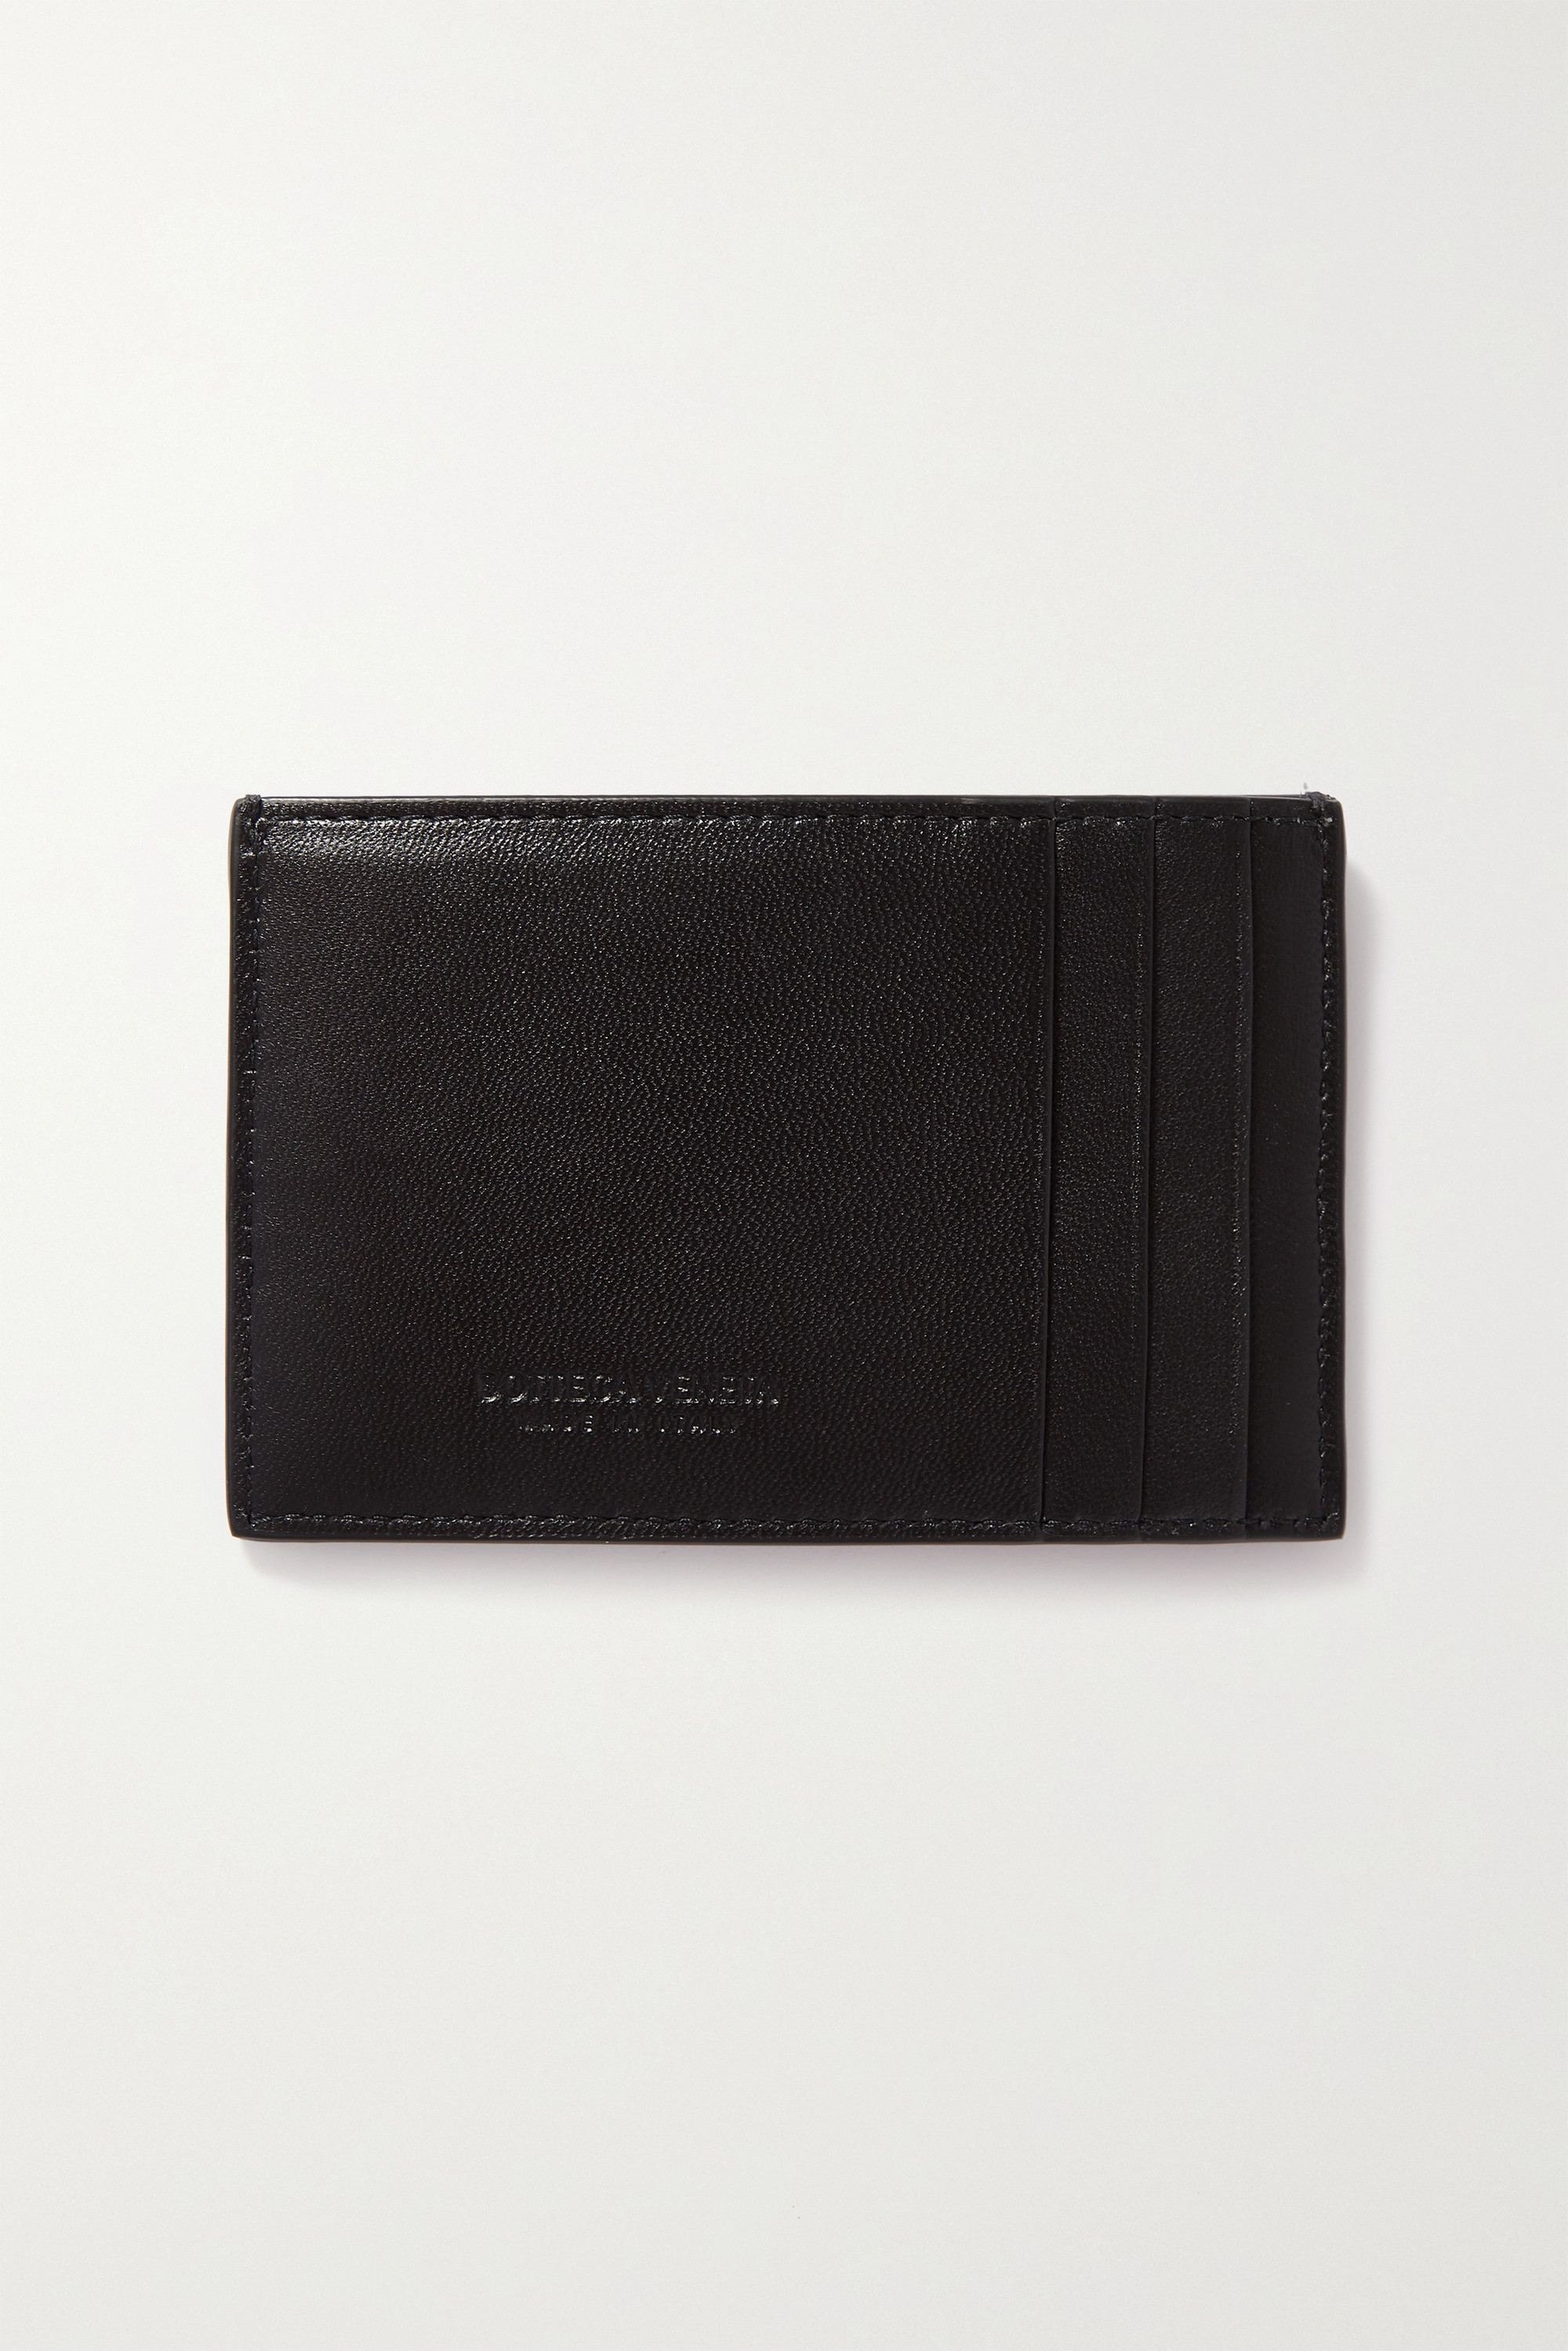 Bottega Veneta Porte-cartes en cuir intrecciato Cassette